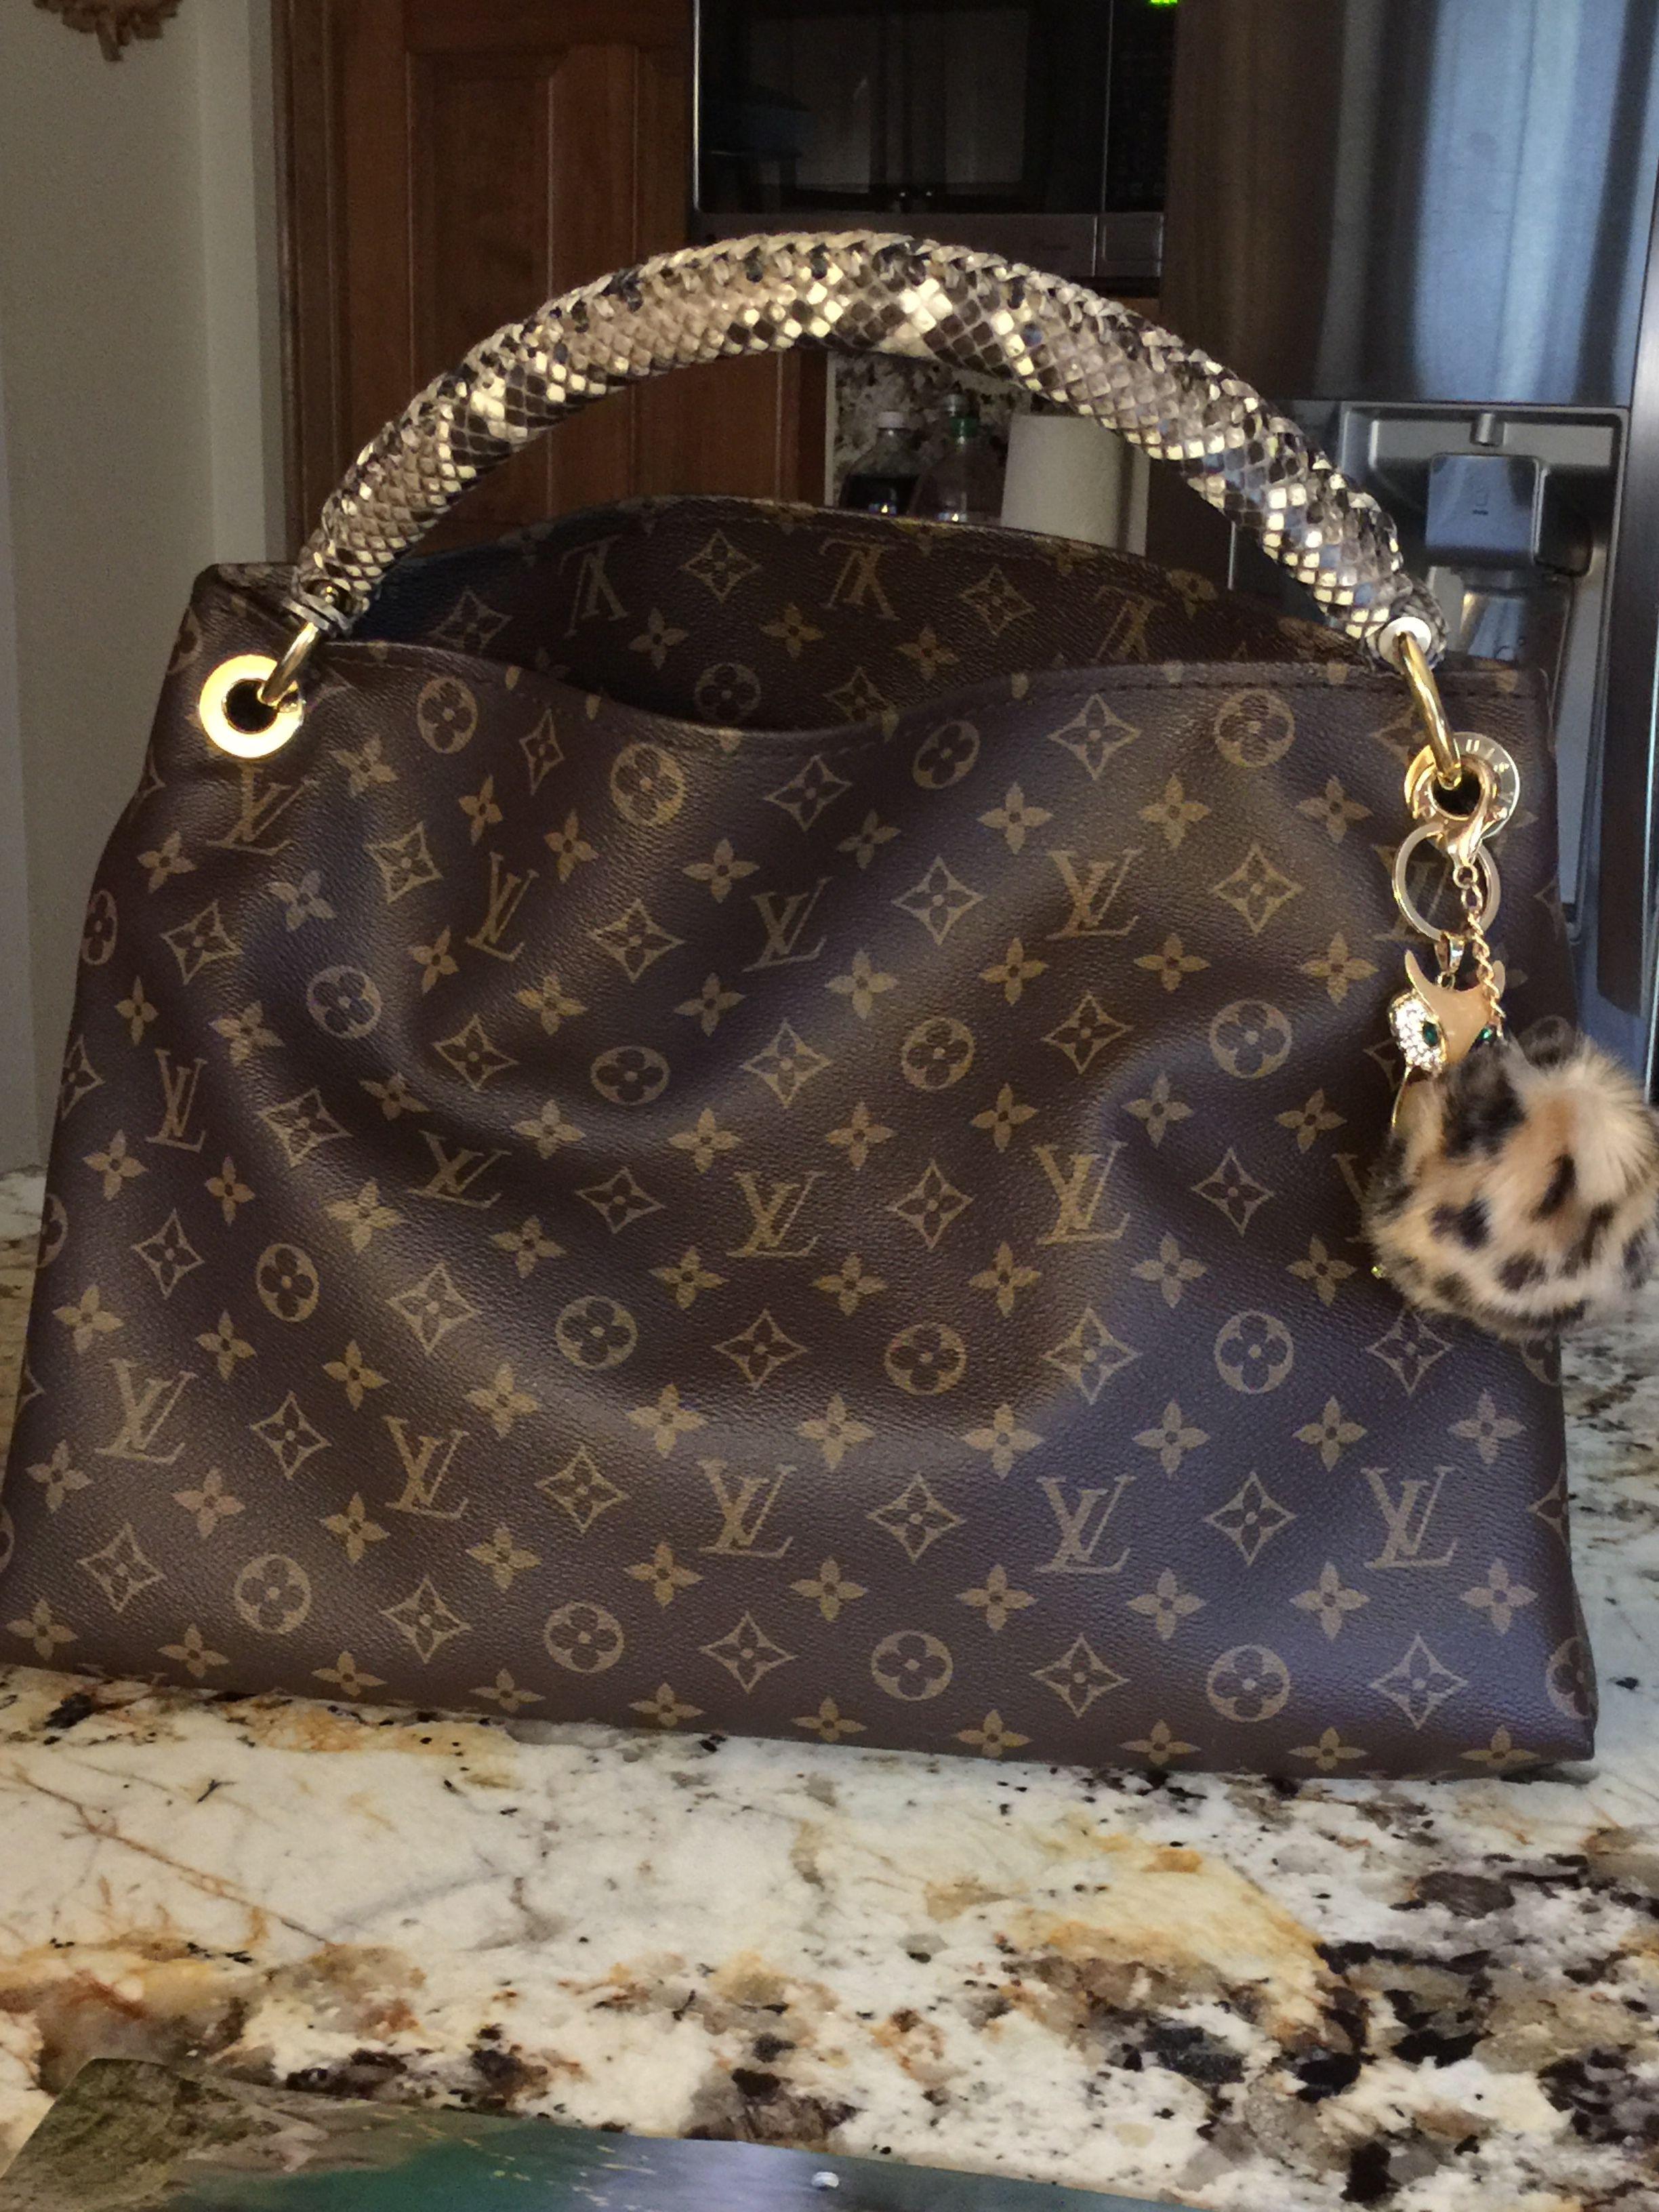 59f29066e5bd LV Artsy Monogram with python handle Louis Vuitton Artsy, Louis Vuitton  Handbags, Louis Vuitton